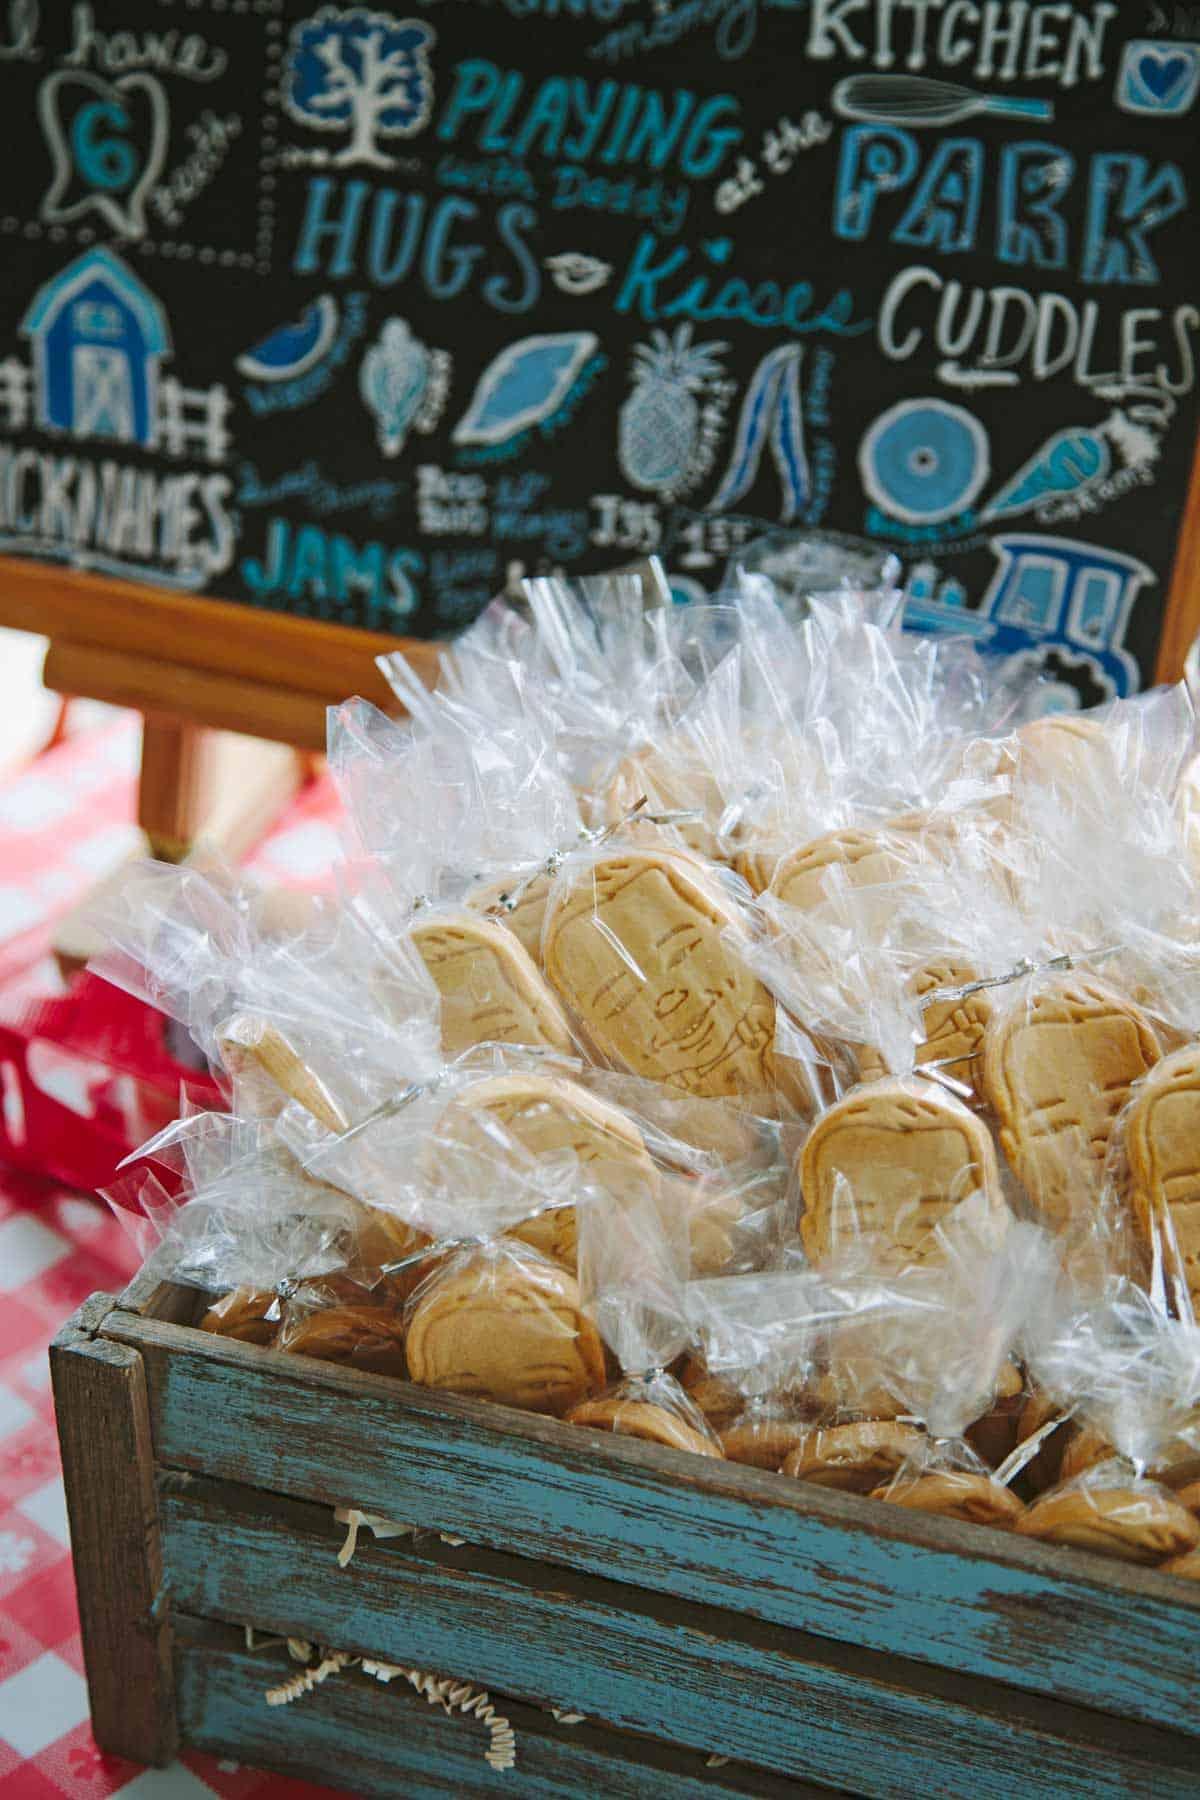 james-1st-bday-parkers-crazy-cookies-design